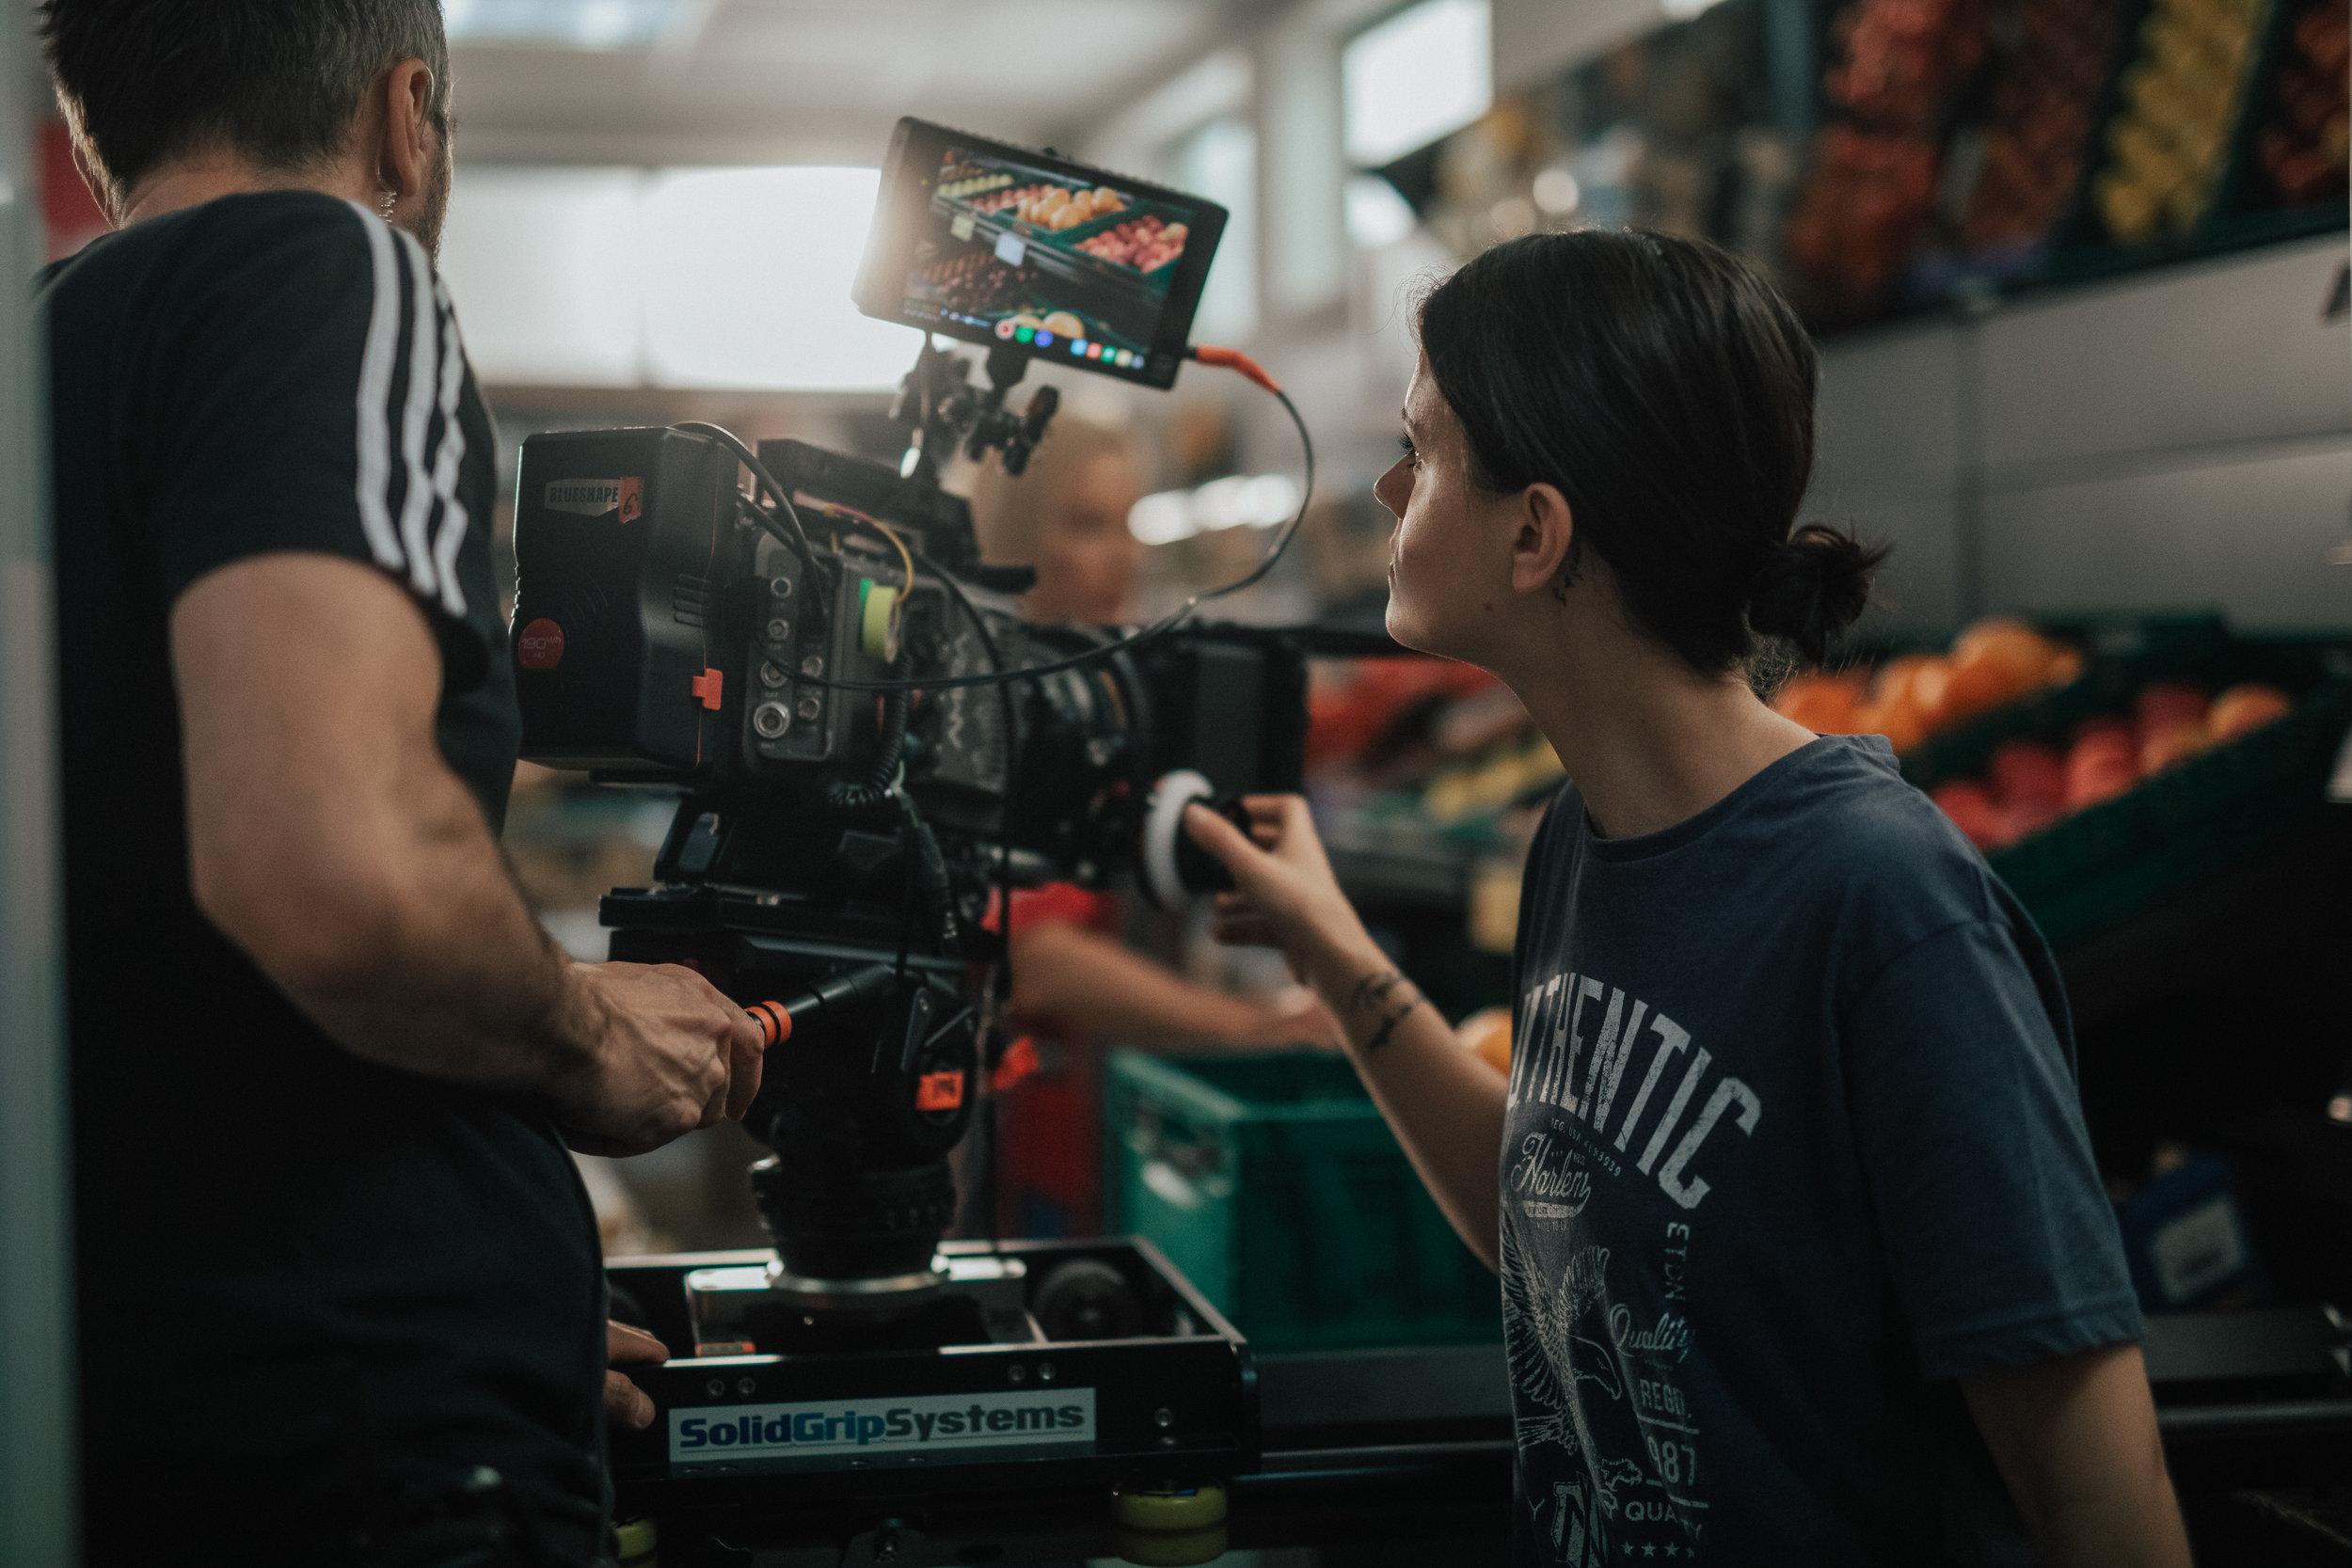 'Reka ljubezni' season 3 (2018)    Production: Perfo    Director: Jaka Suligoj    DOP: Maks Susnik    In frame: DOP Maks Susnik, AC Sara Ivanov